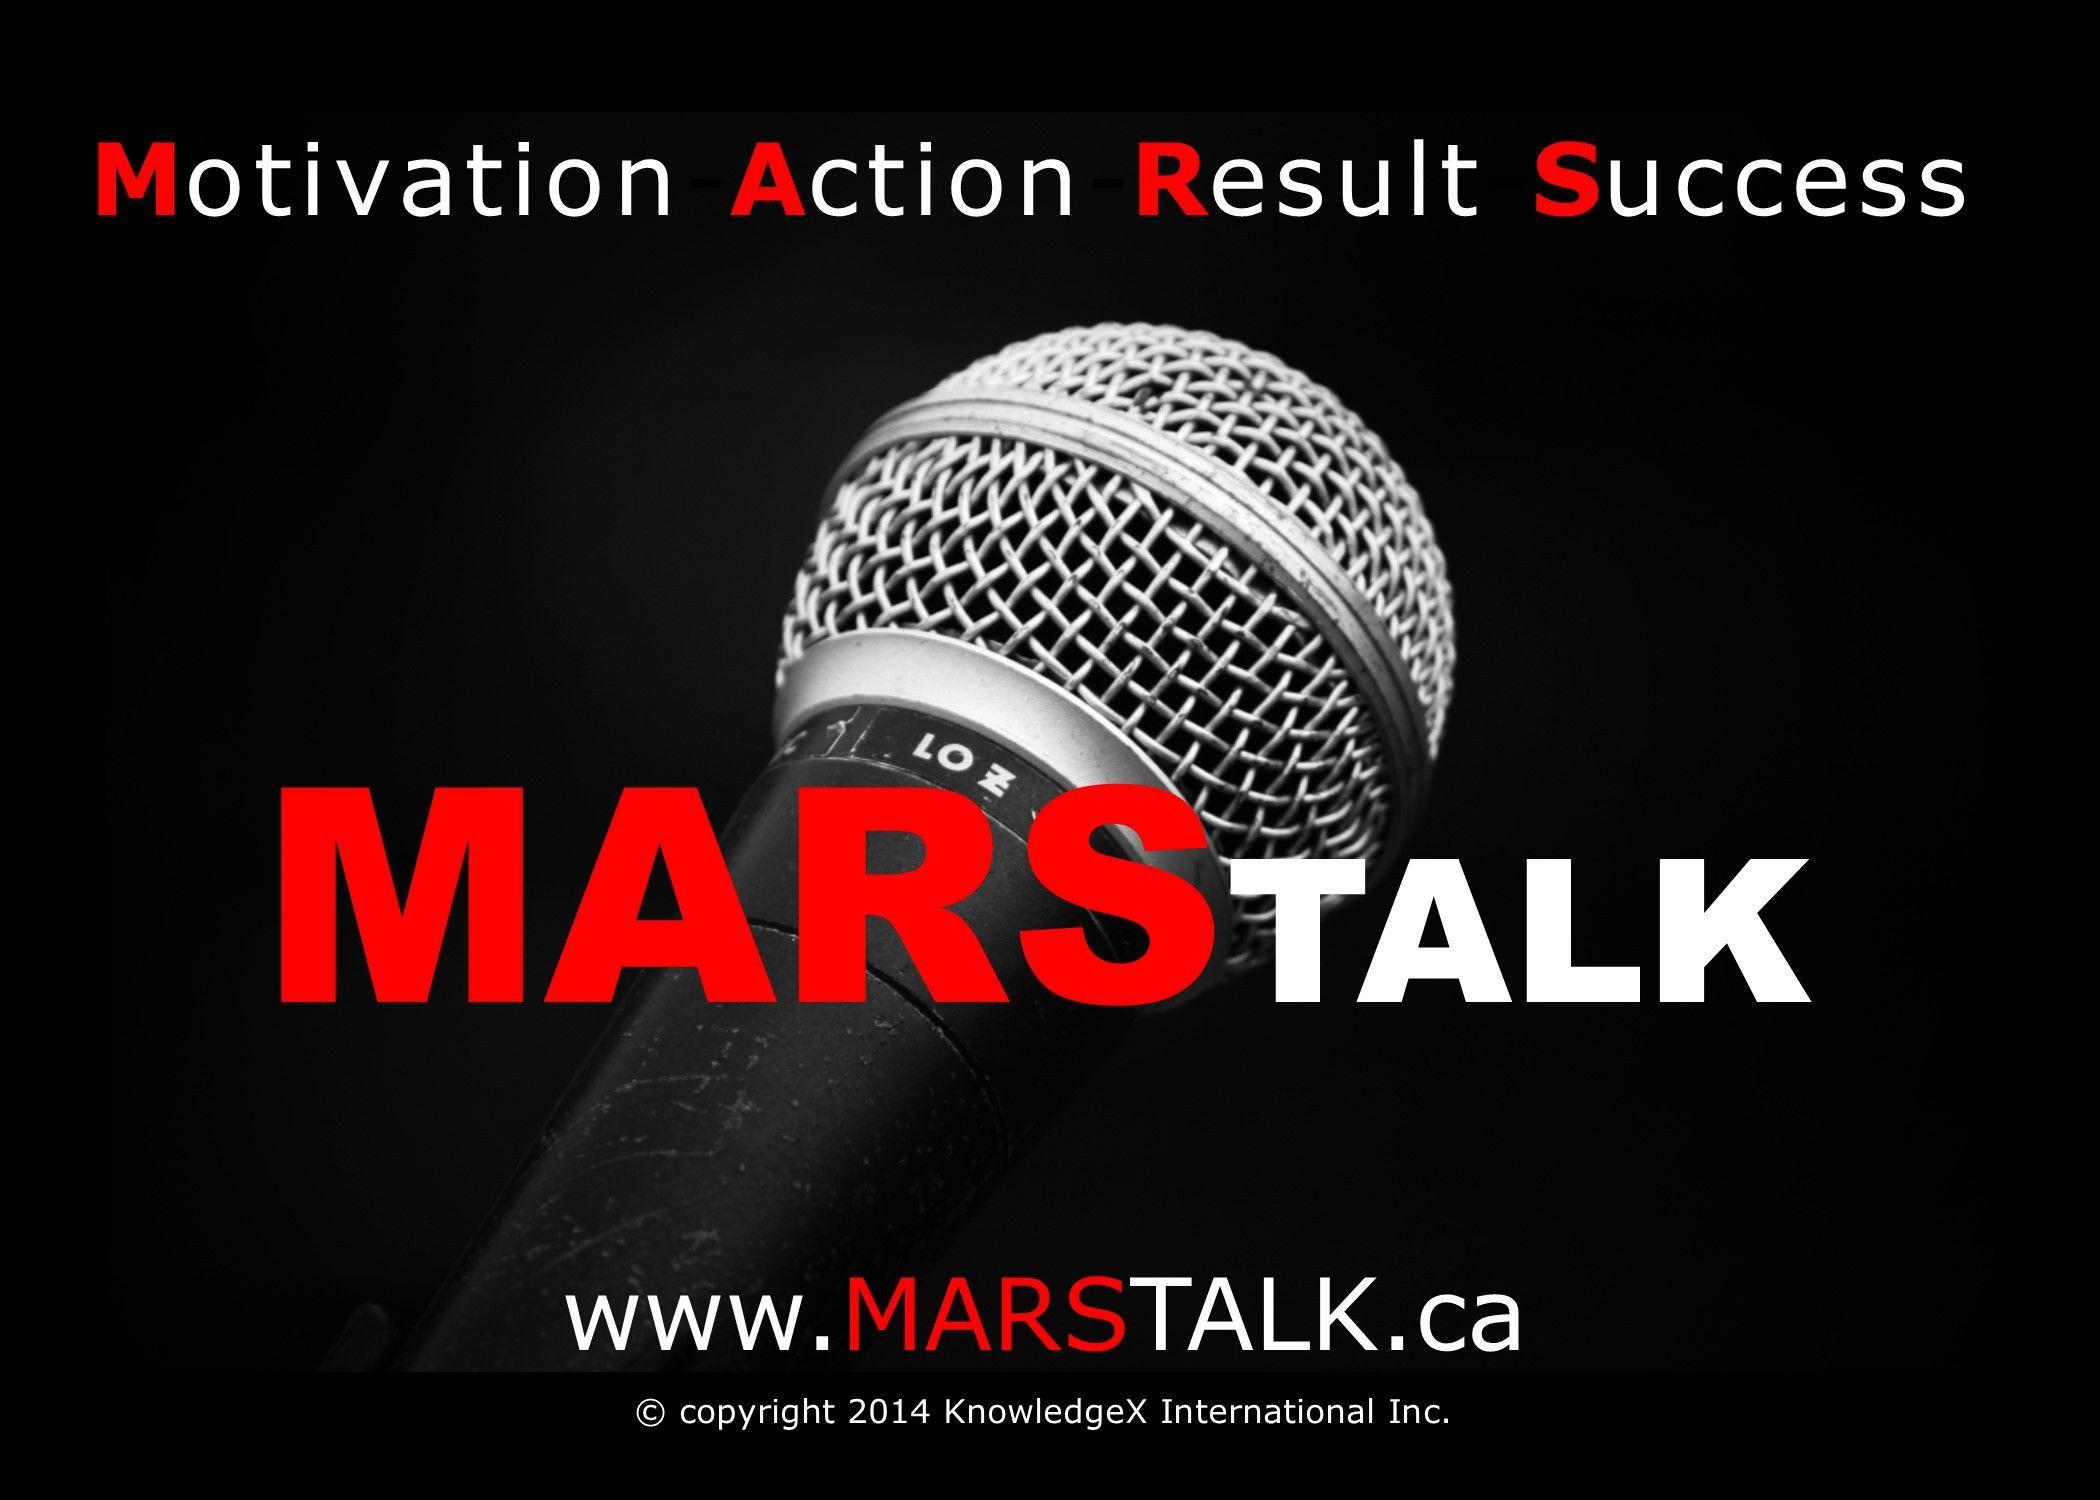 MARSTalk Charity Event: Storytelling, Impromp